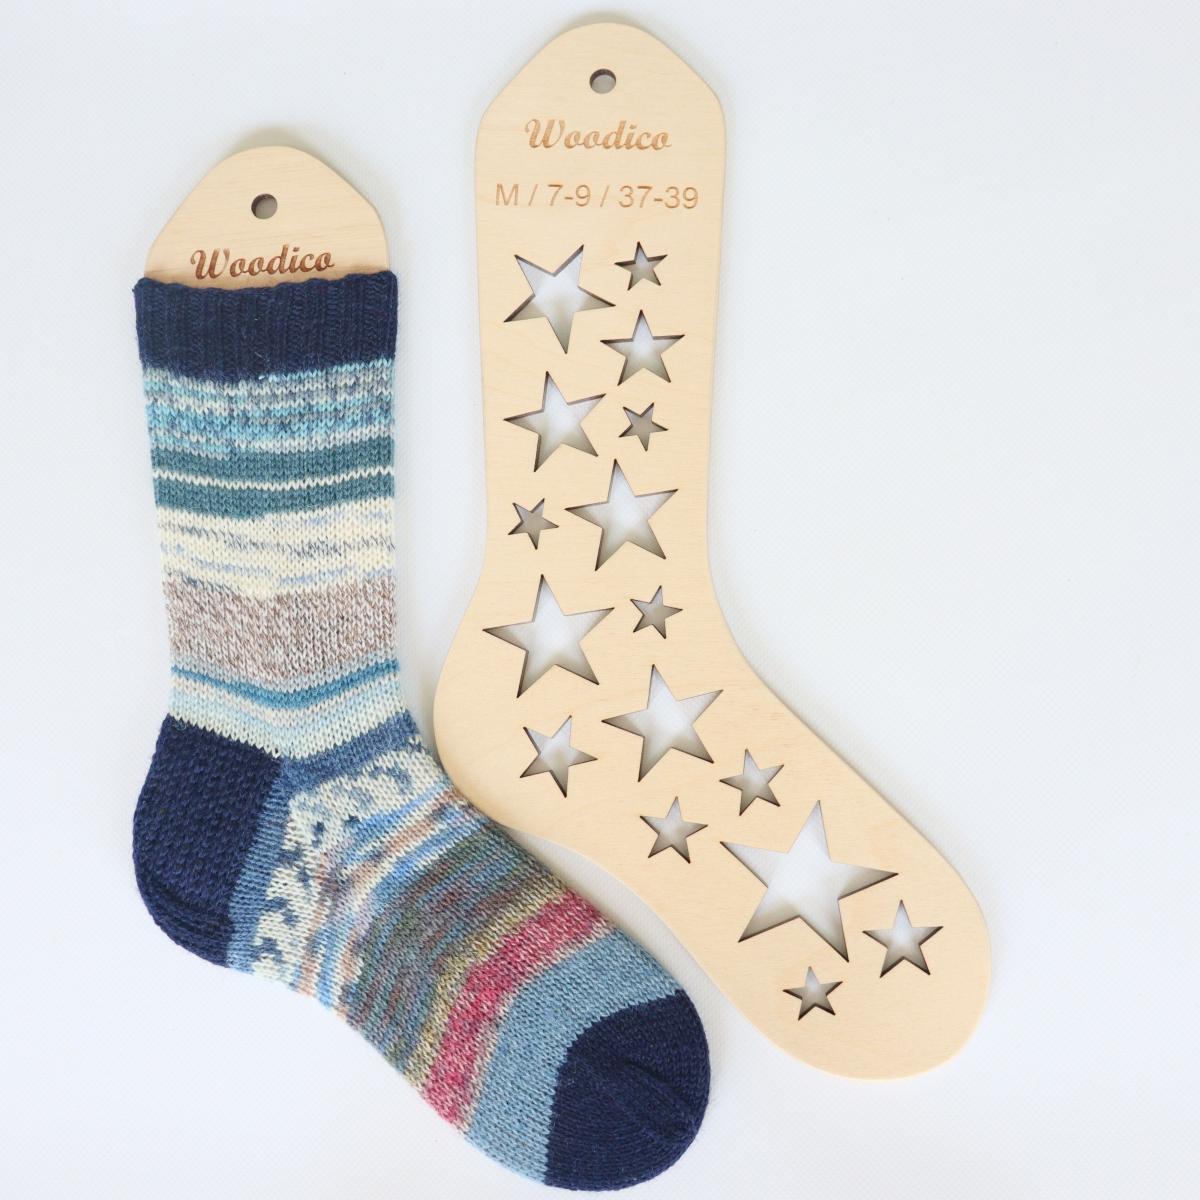 woodico.pro wooden sock blockers stars 4 1200x1200 - Wooden sock blockers / Stars